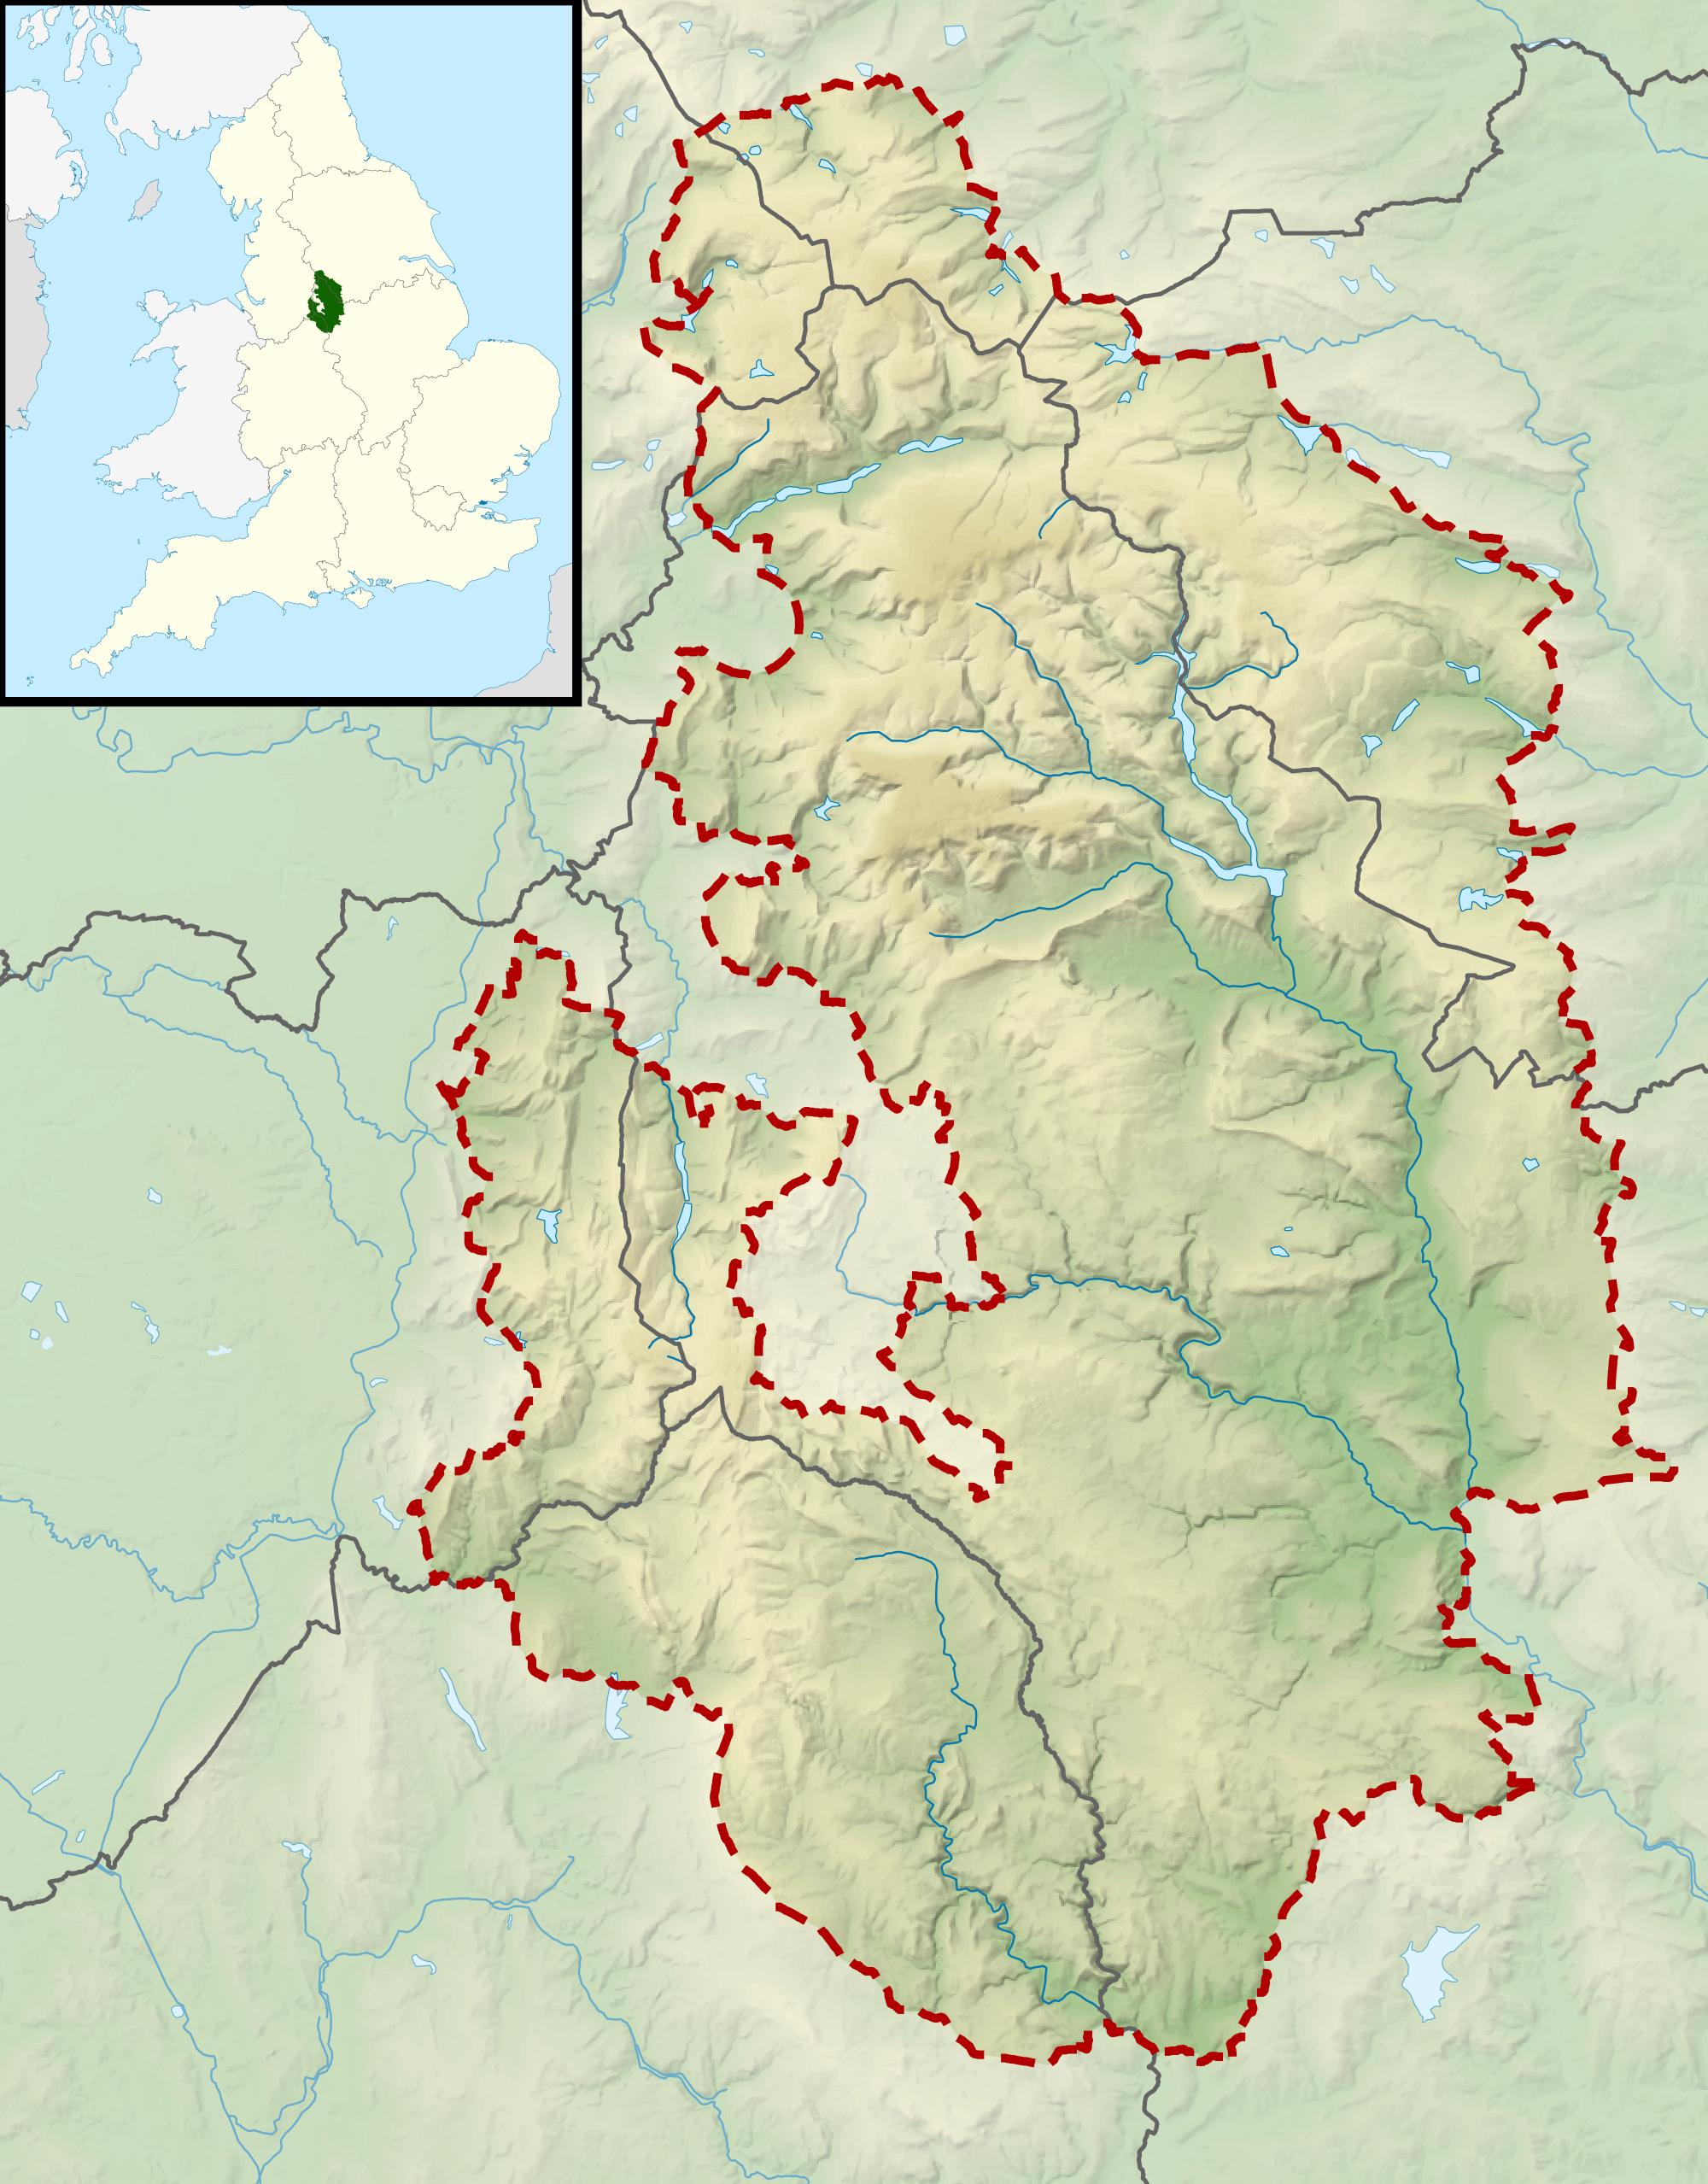 FilePeak District National Park UK Relief Location Mappng - National parks locations map